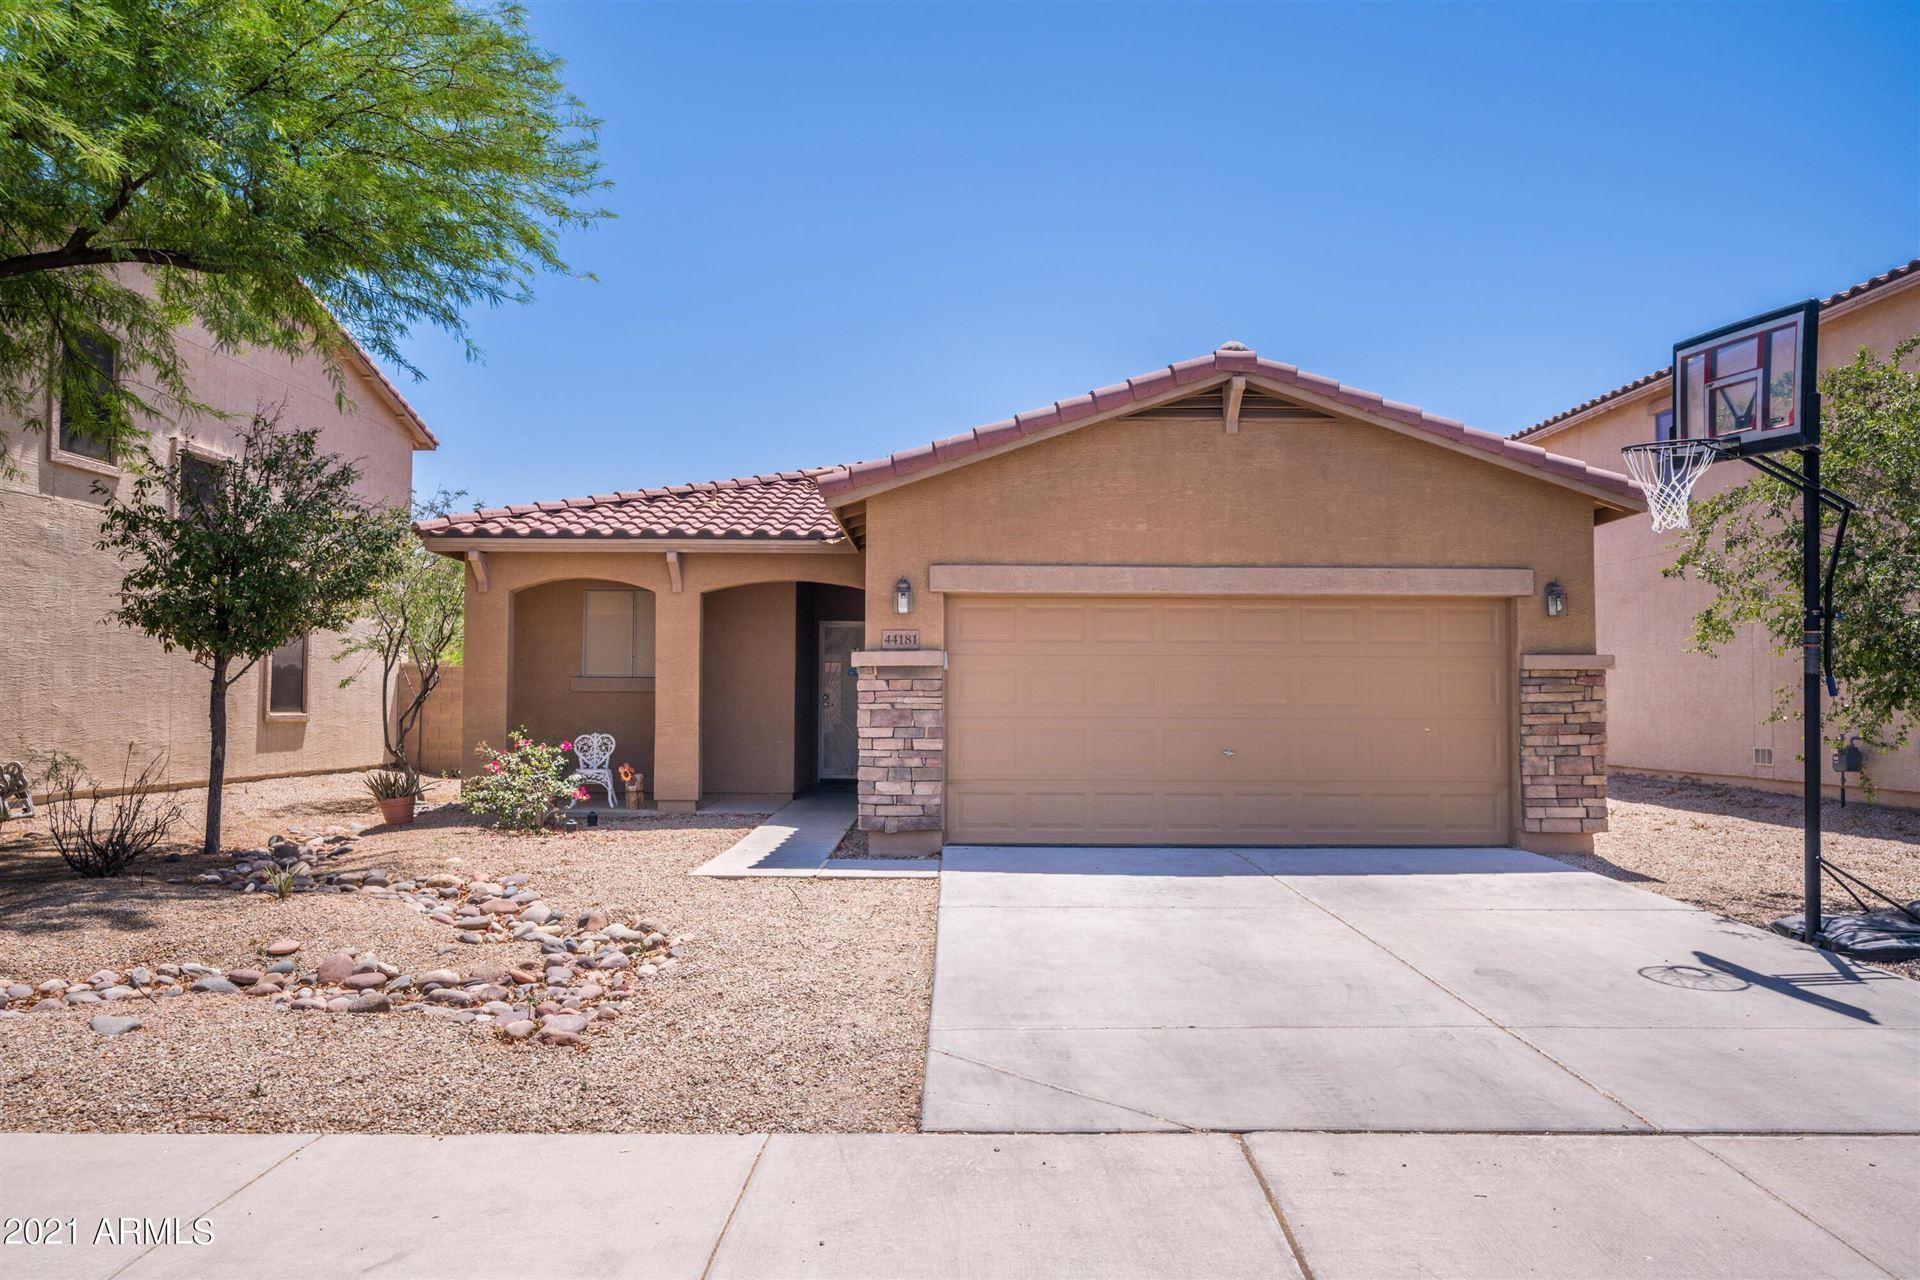 Photo for 44181 W KRAMER Lane, Maricopa, AZ 85138 (MLS # 6241002)